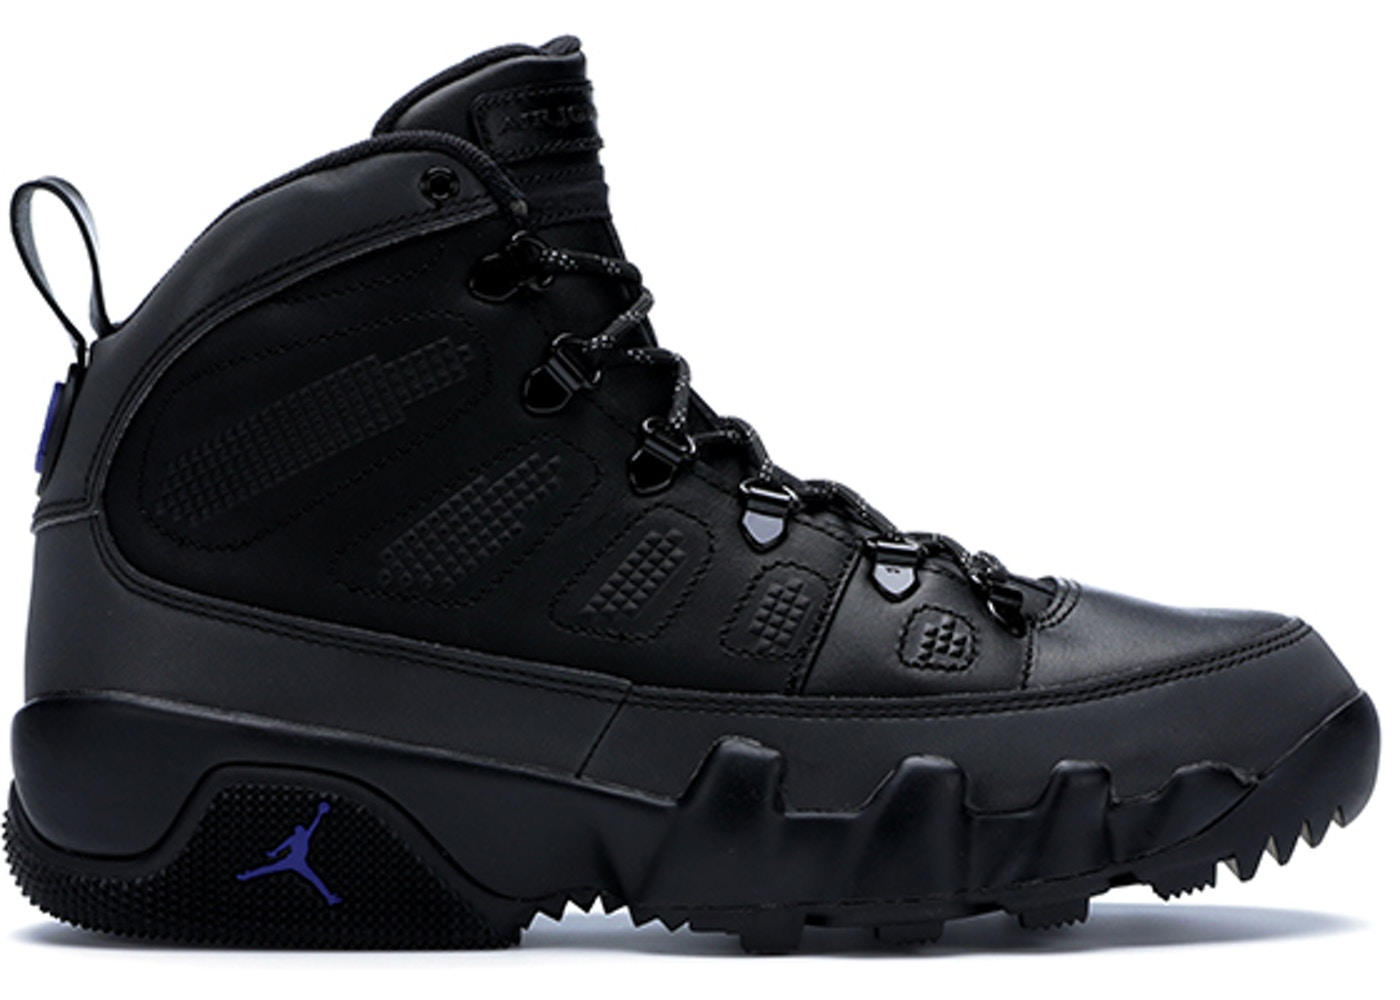 Jordan 9 Retro Boot Black Concord - AR4491-001 a30b36082328